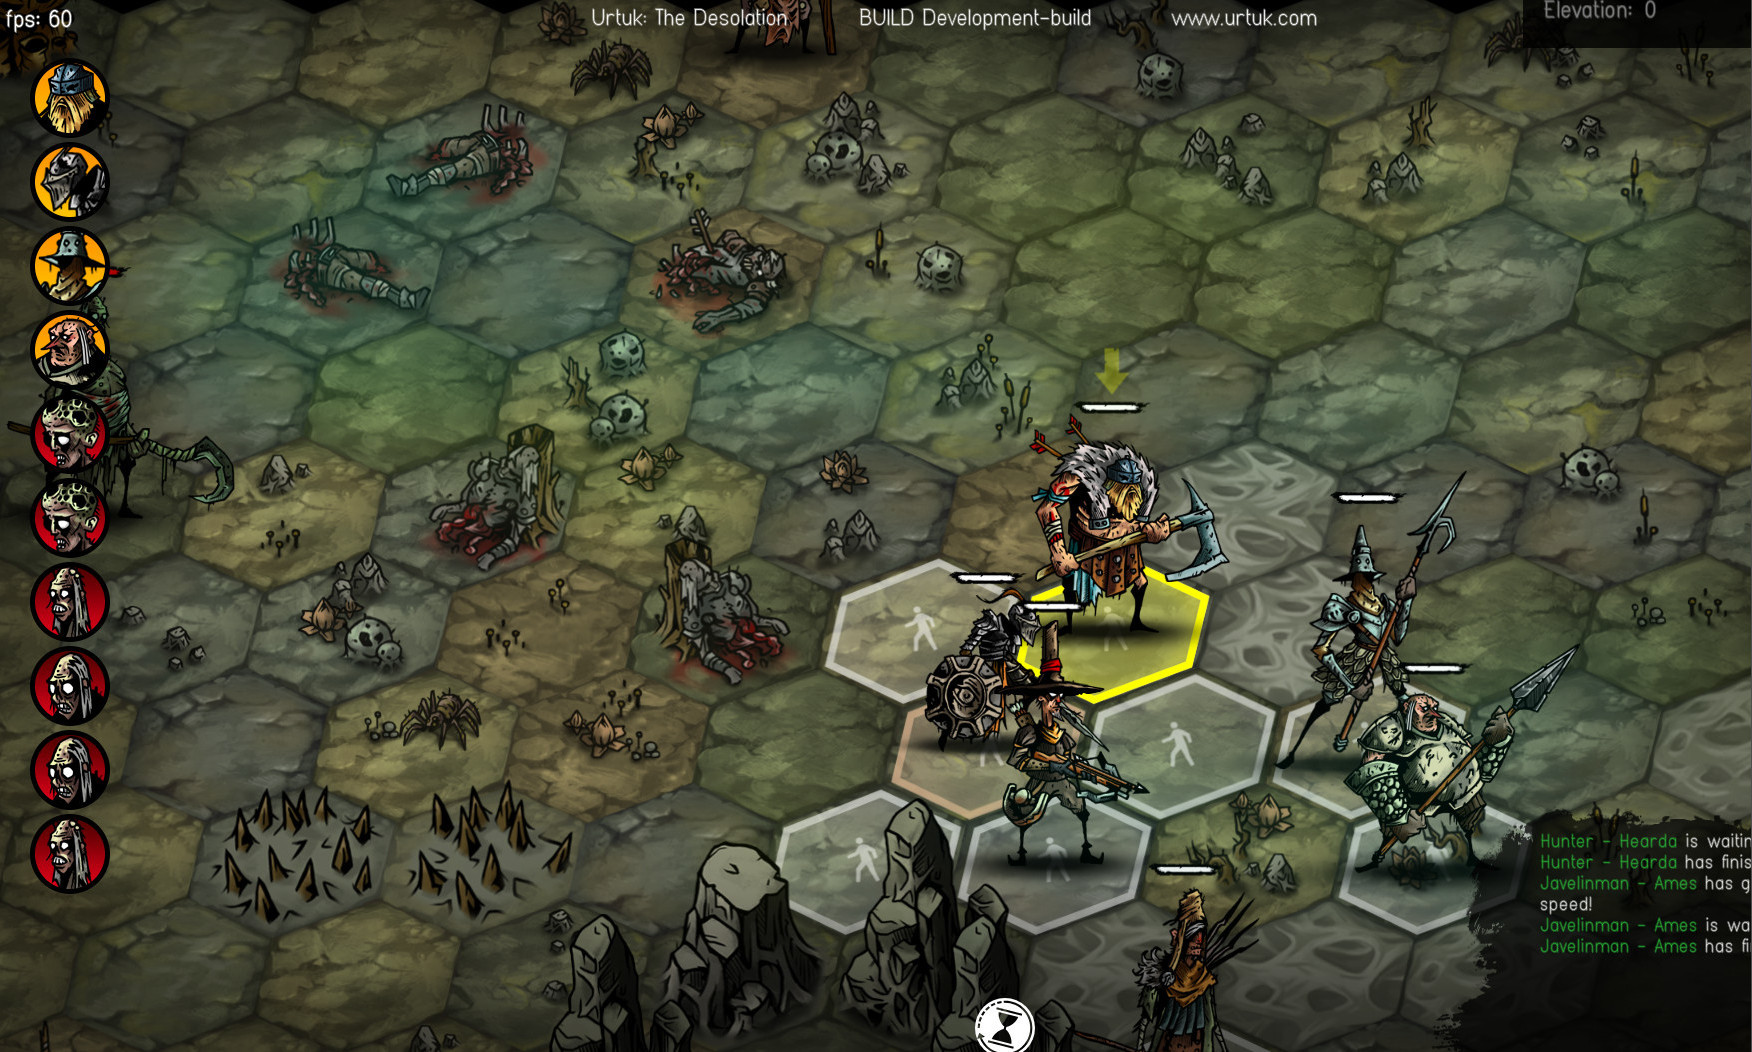 Urtuk: The Desolation Free Download